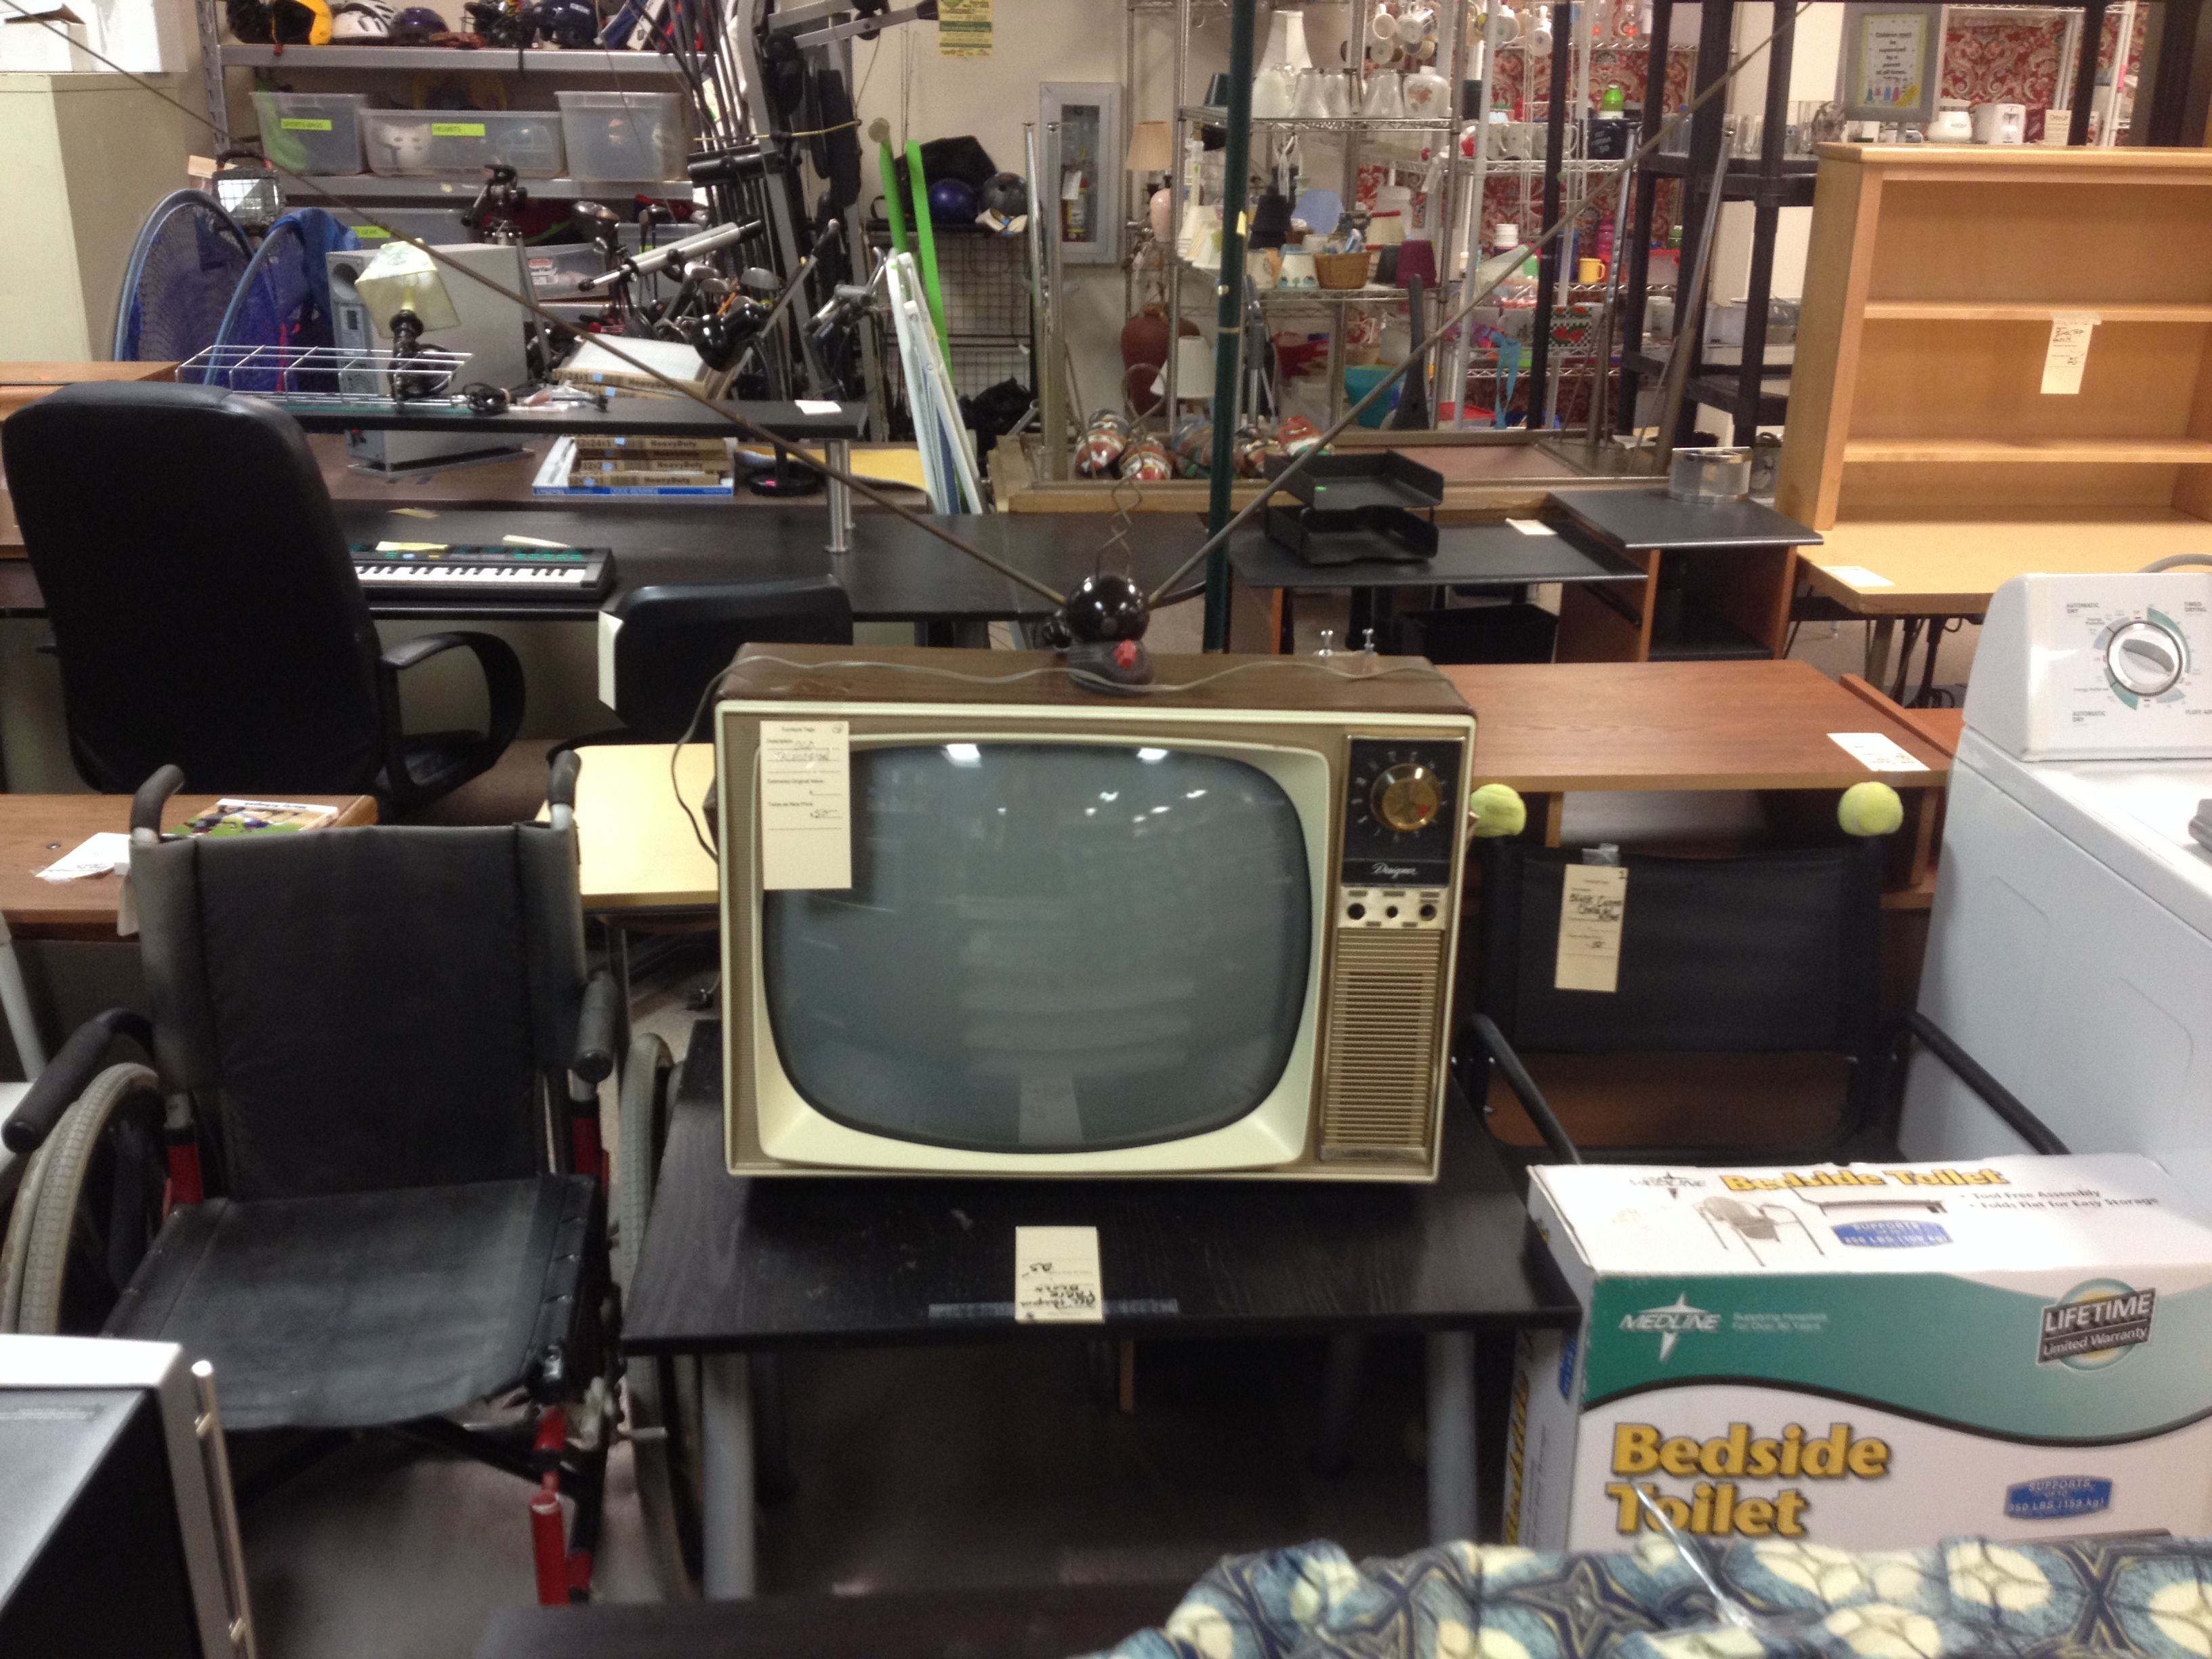 Vintage TV at Twice as Nice in Denton retro furniture Pinterest